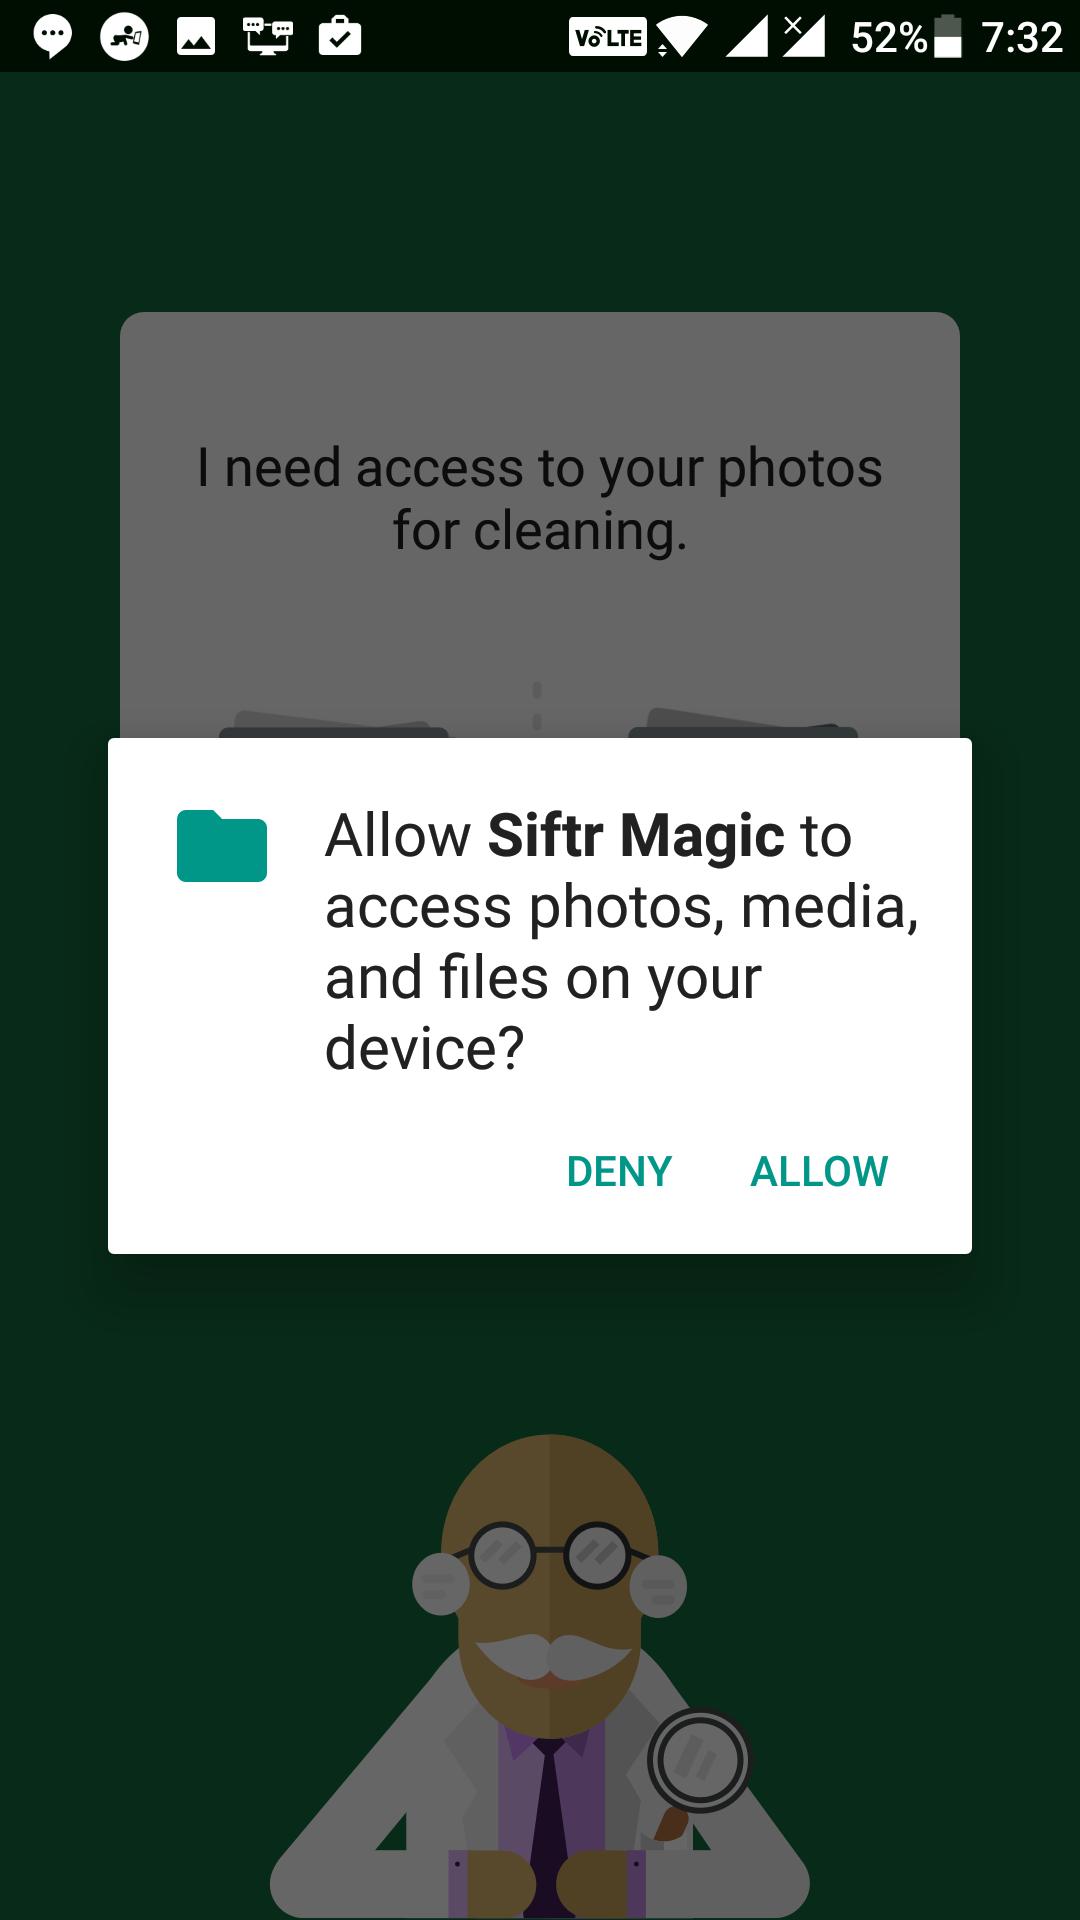 remove-old-whatsapp-photos-allow